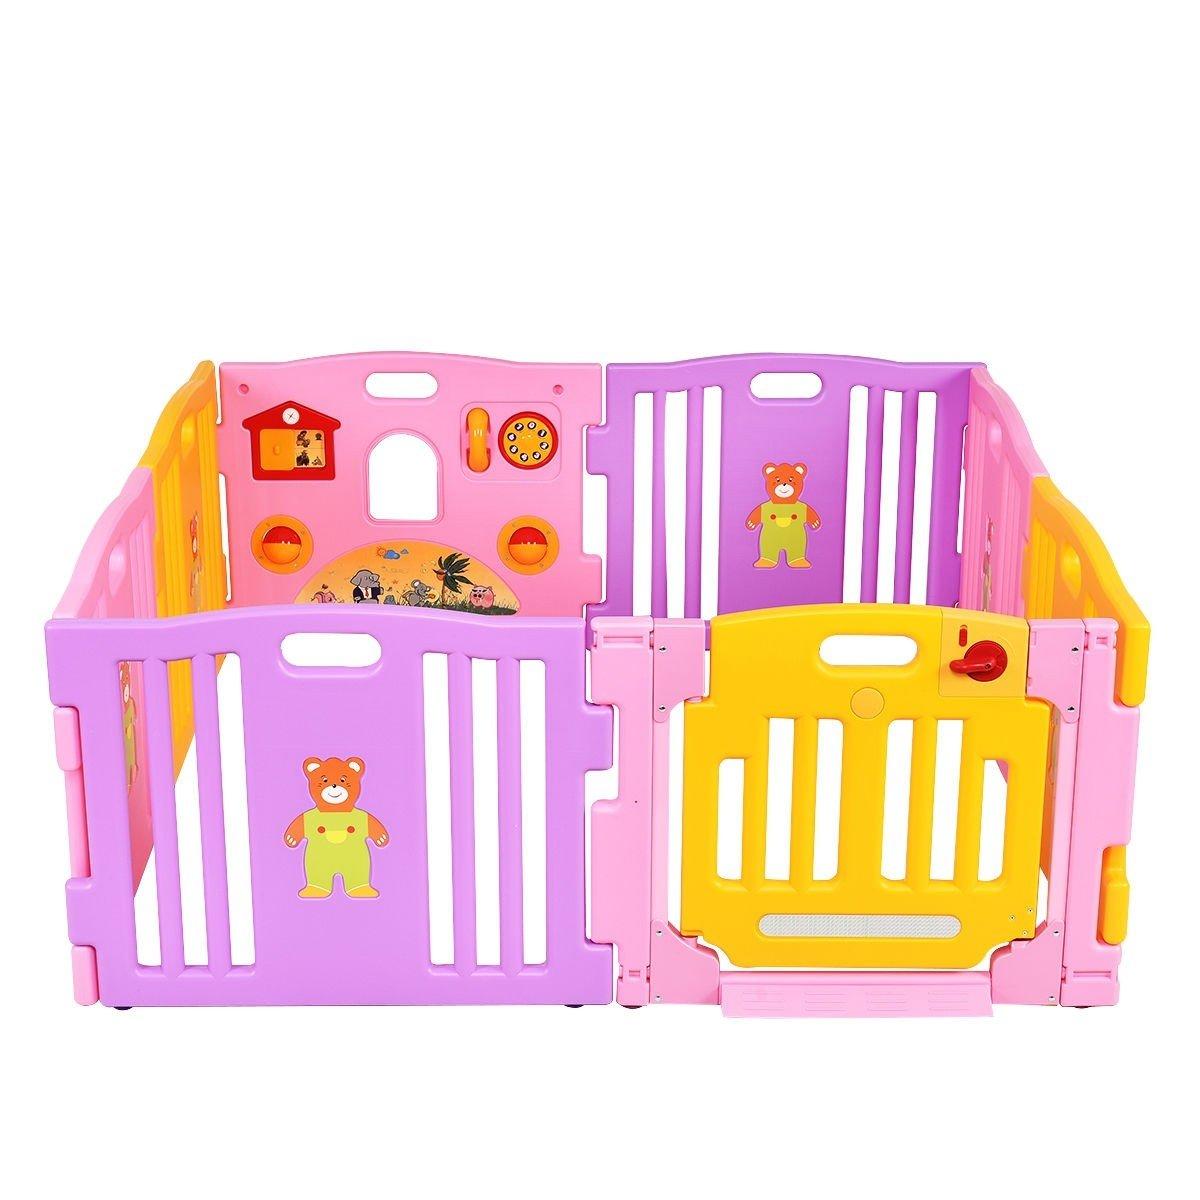 Pink 8 Panel Baby Playpen Kids Safety Play Center Center Yard Pink Indoor CHOOSEandBUY by CHOOSEandBUY (Image #4)